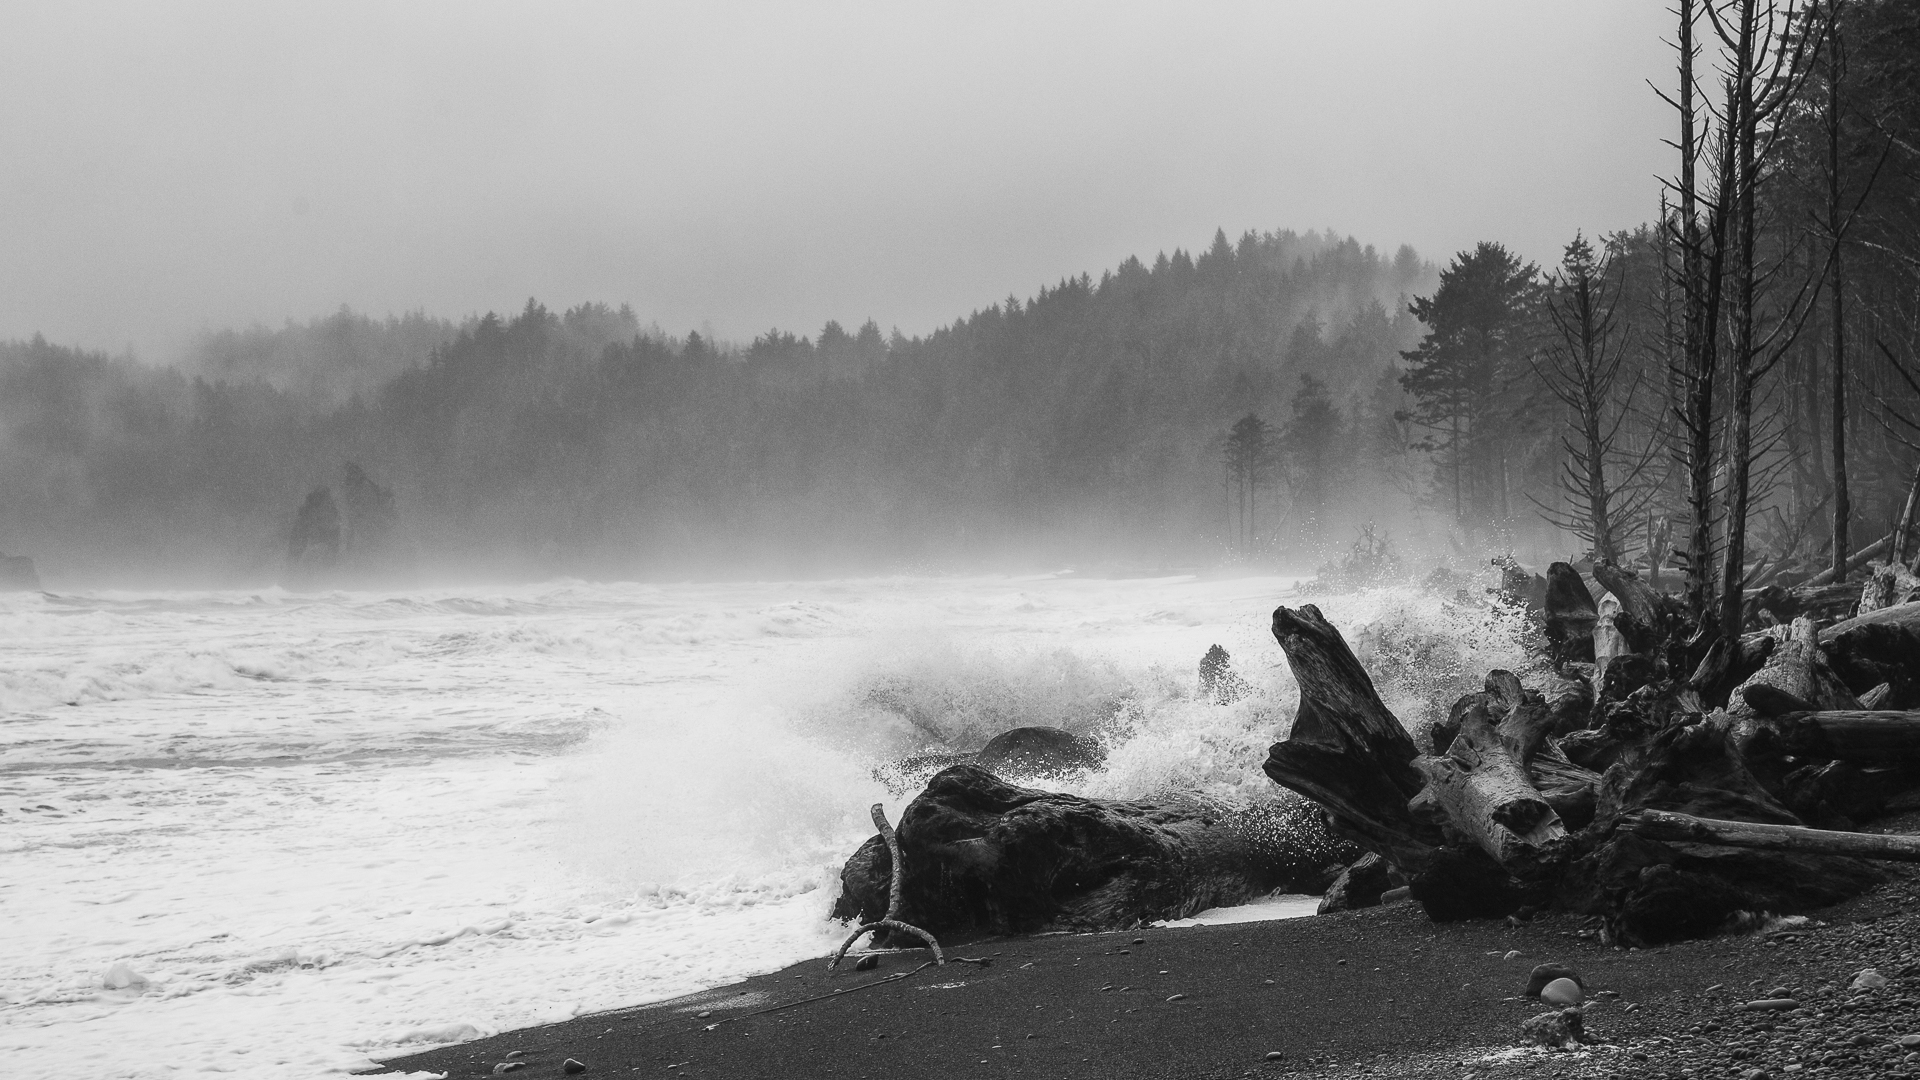 Waves crashing on Rialto Beach.